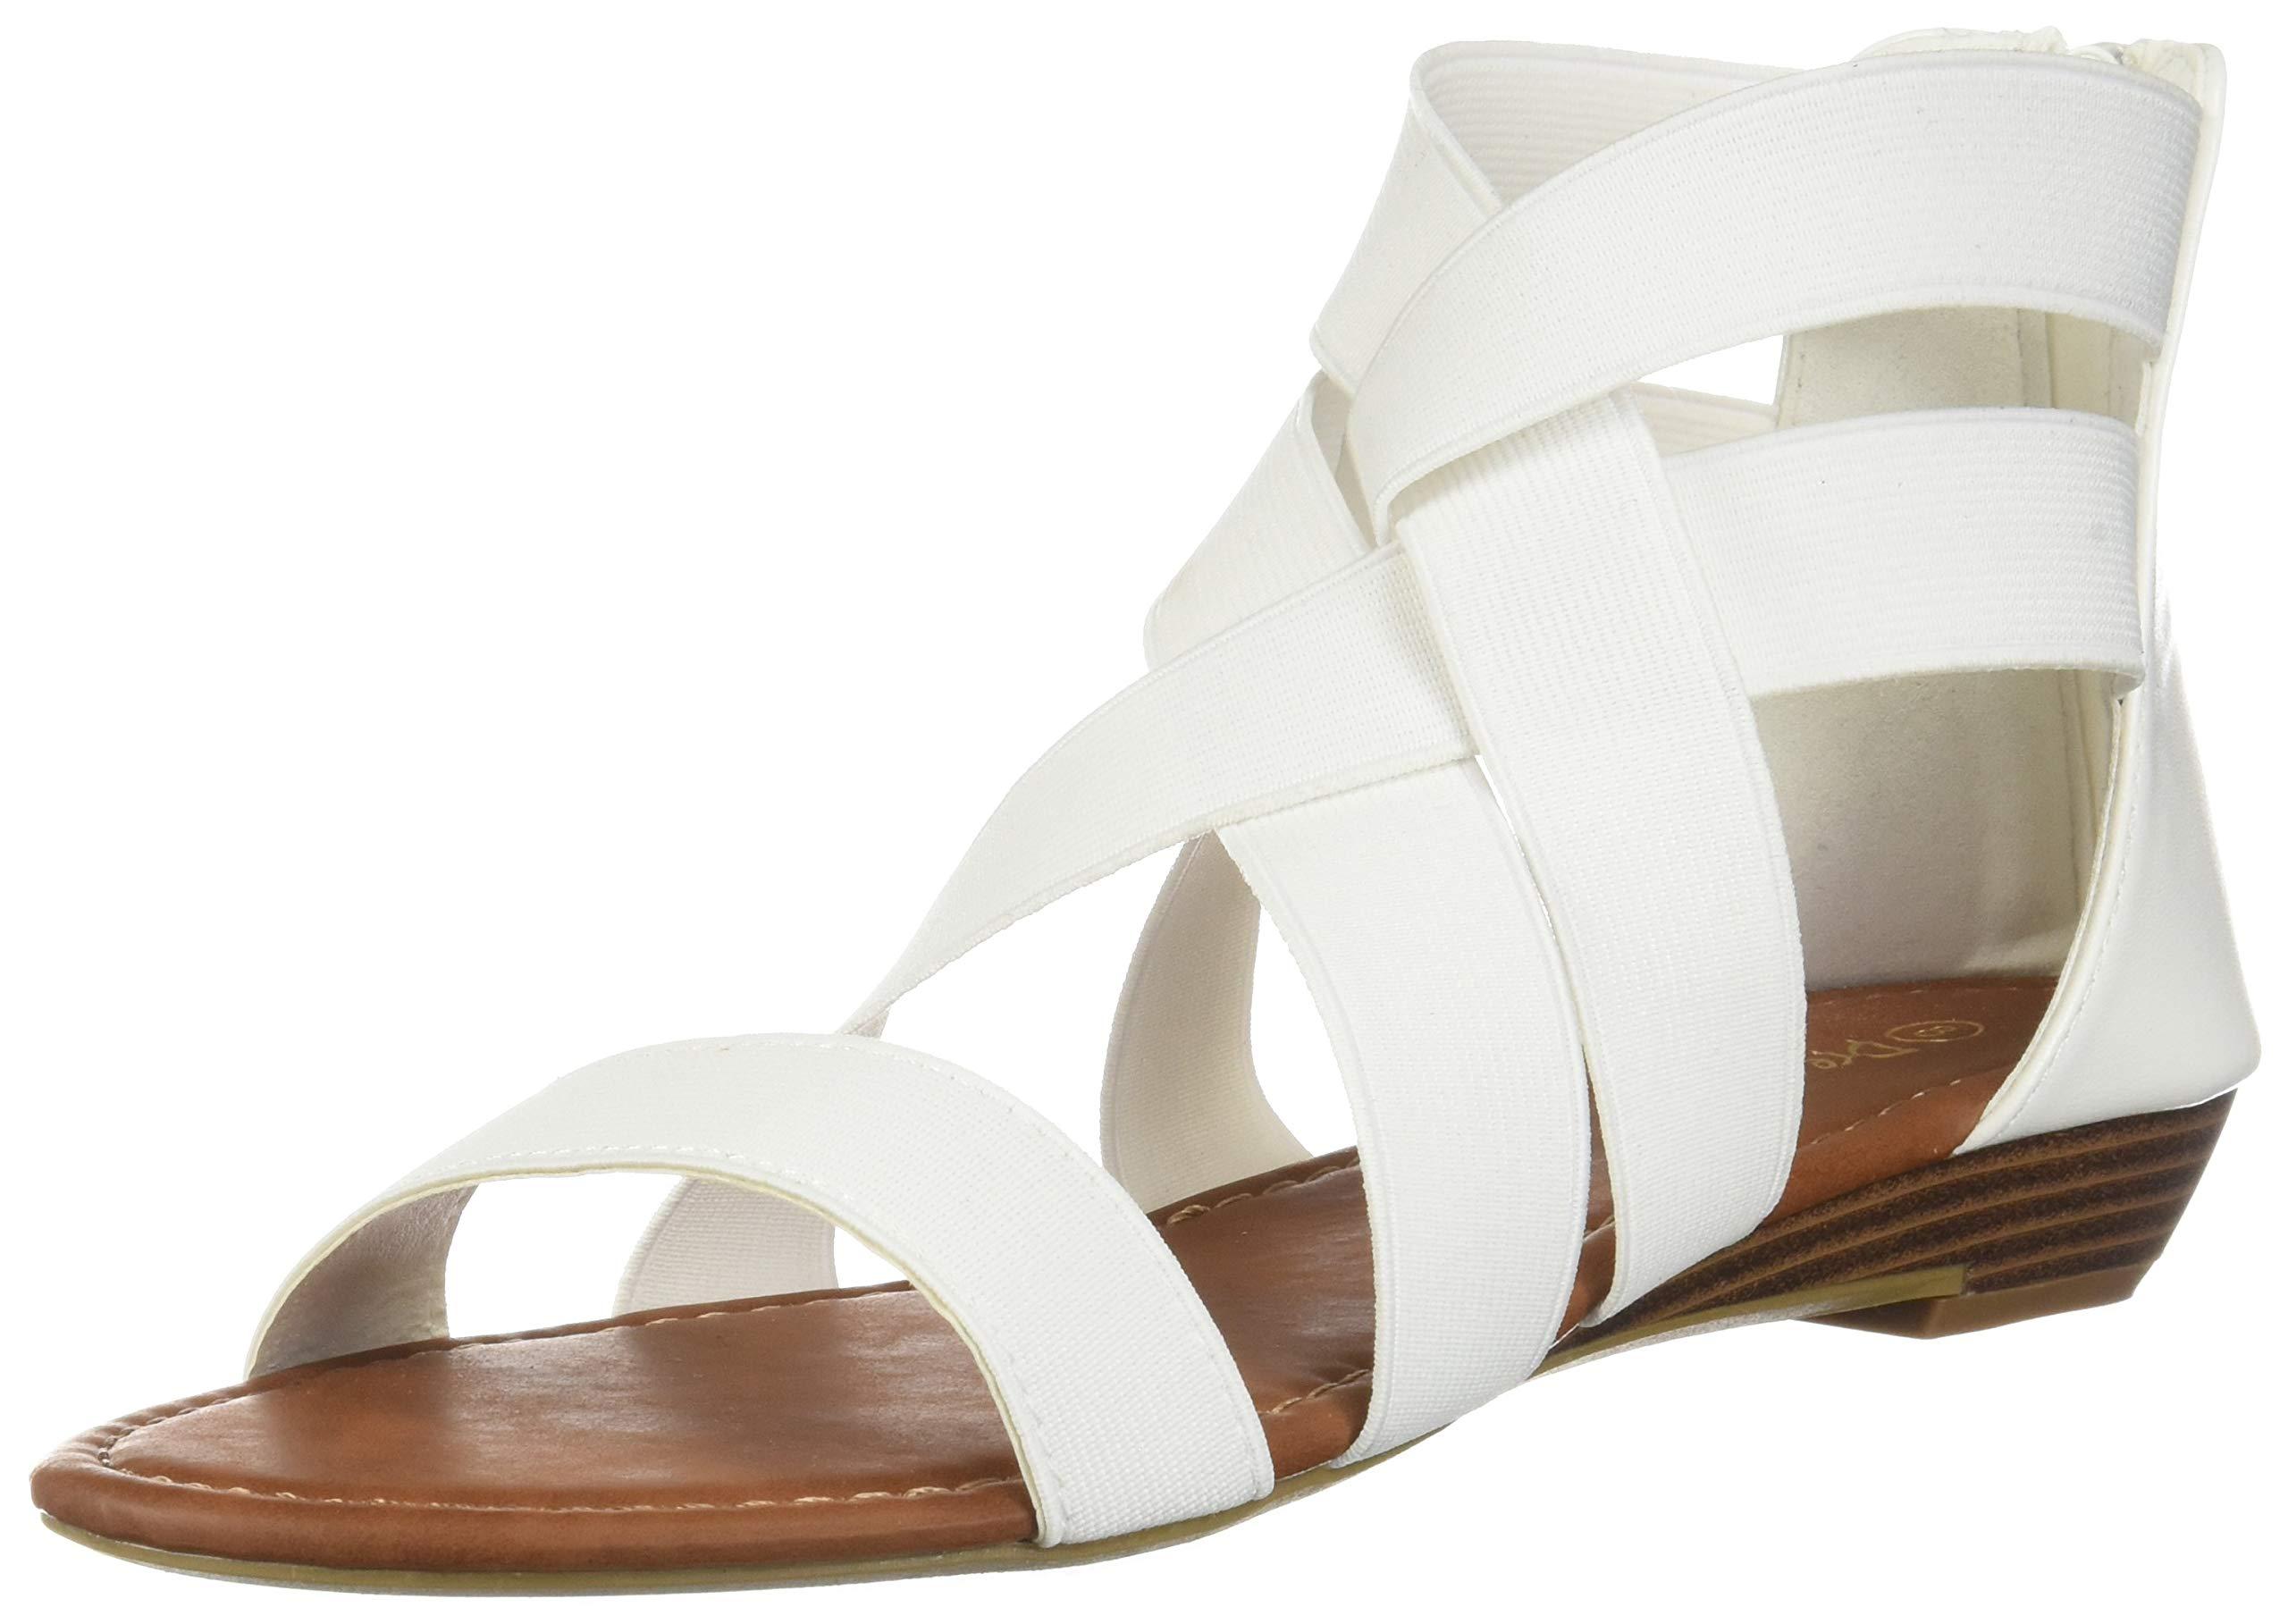 f42361bc8 DREAM PAIRS Women s Jewel Rhinestones Design Ankle High Flat Sandals